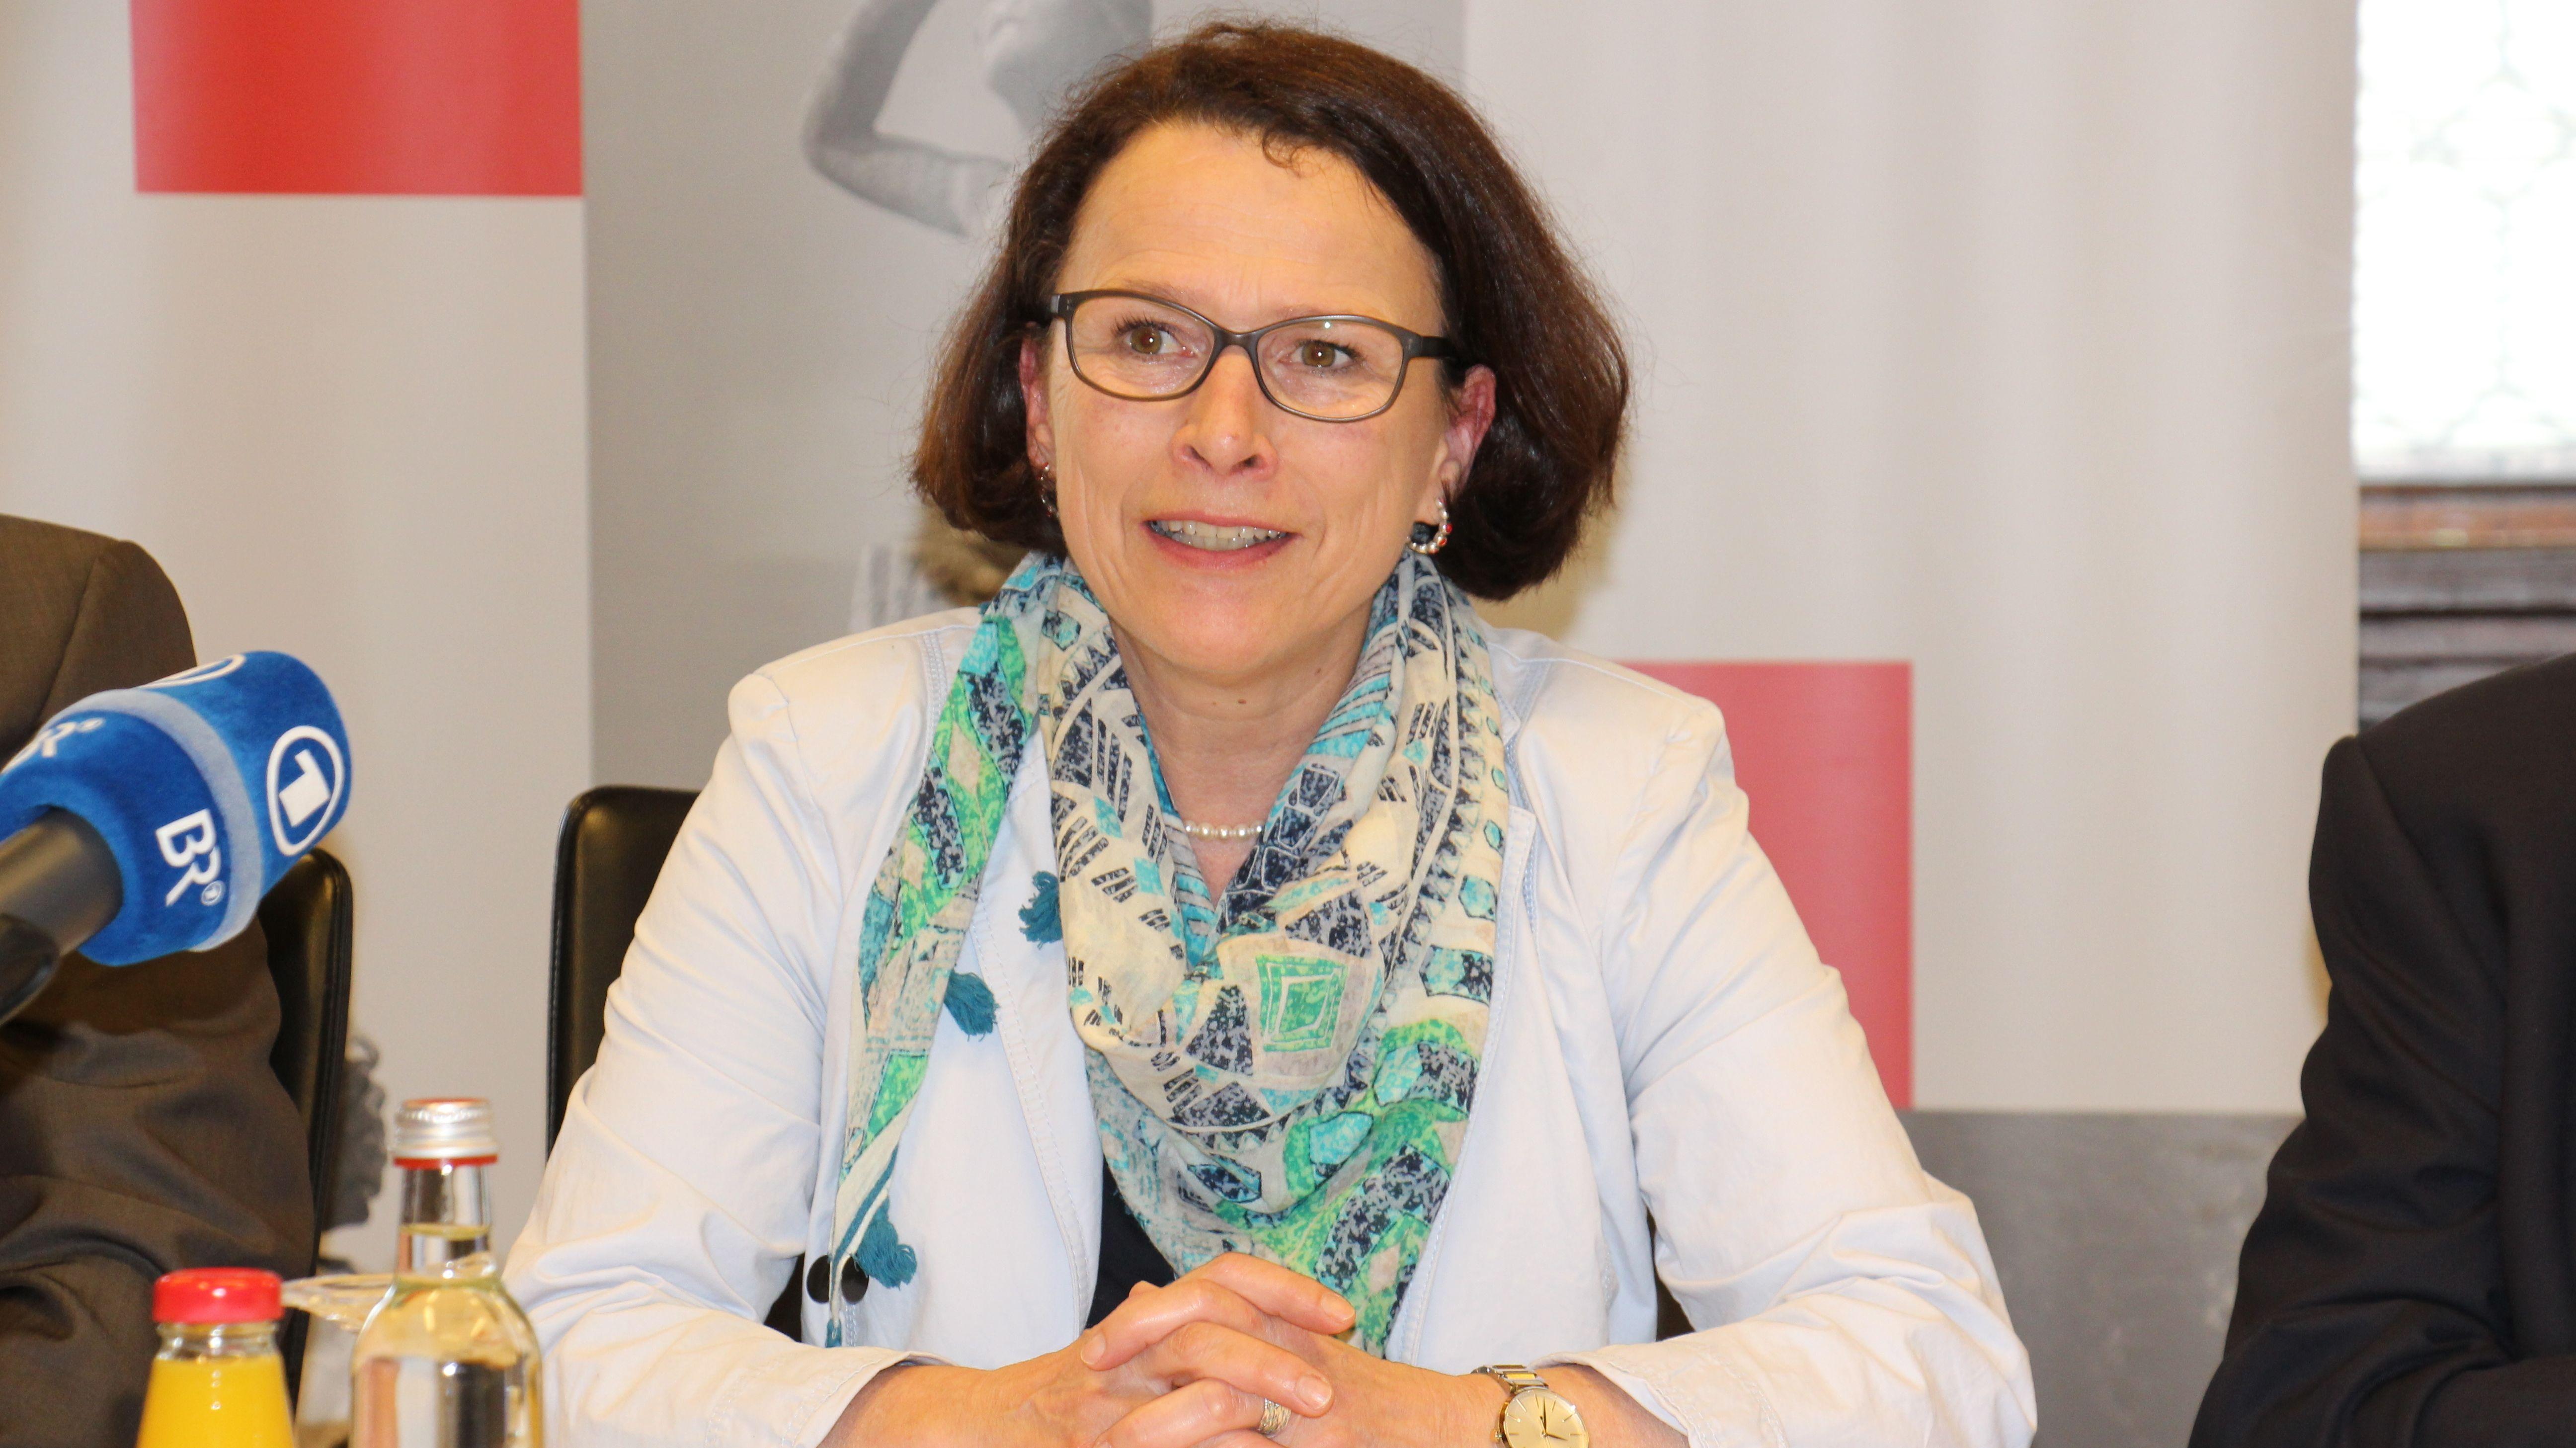 Regensburger Bürgermeisterin Gertrud Maltz-Schwarzfischer (SPD).